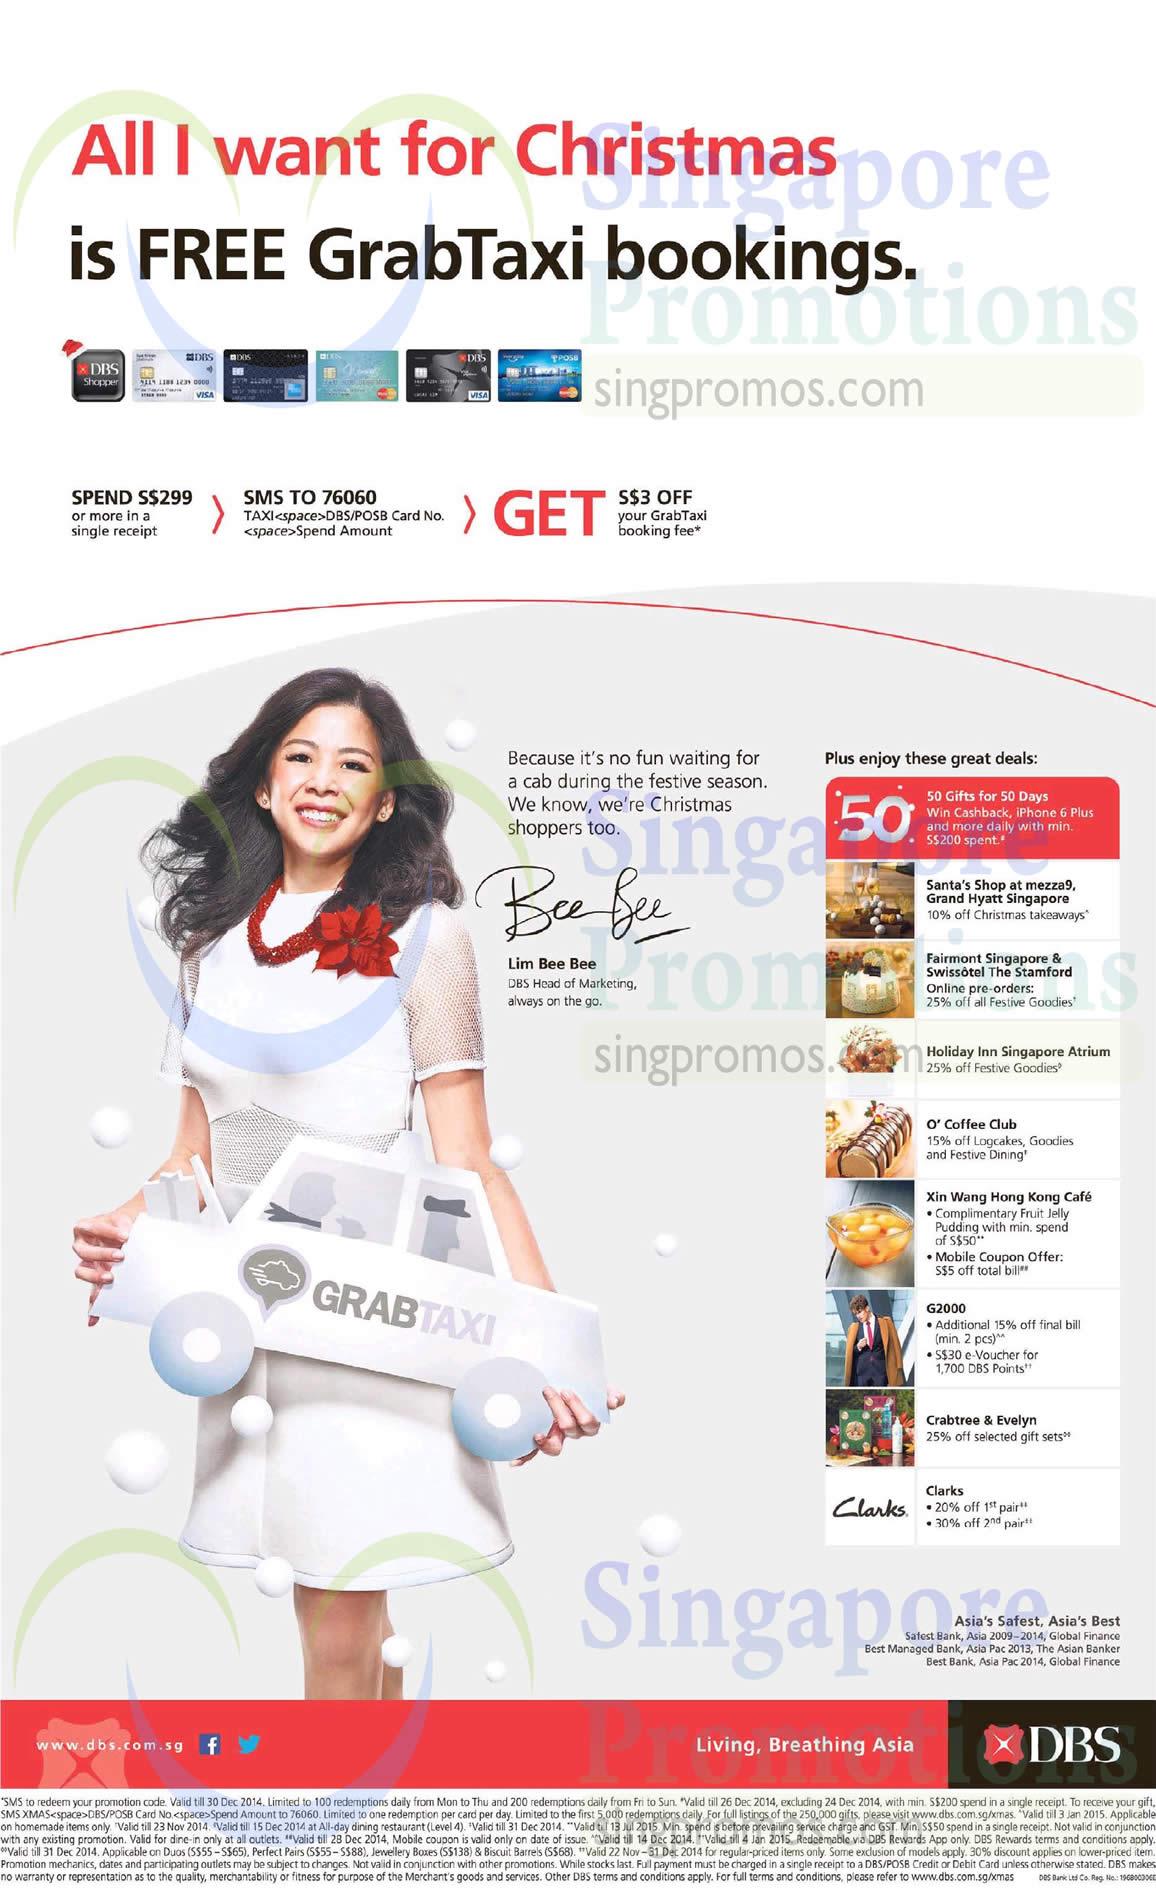 Comgateway Promo Code Dbs (Aug 2019)   SINGPromos com